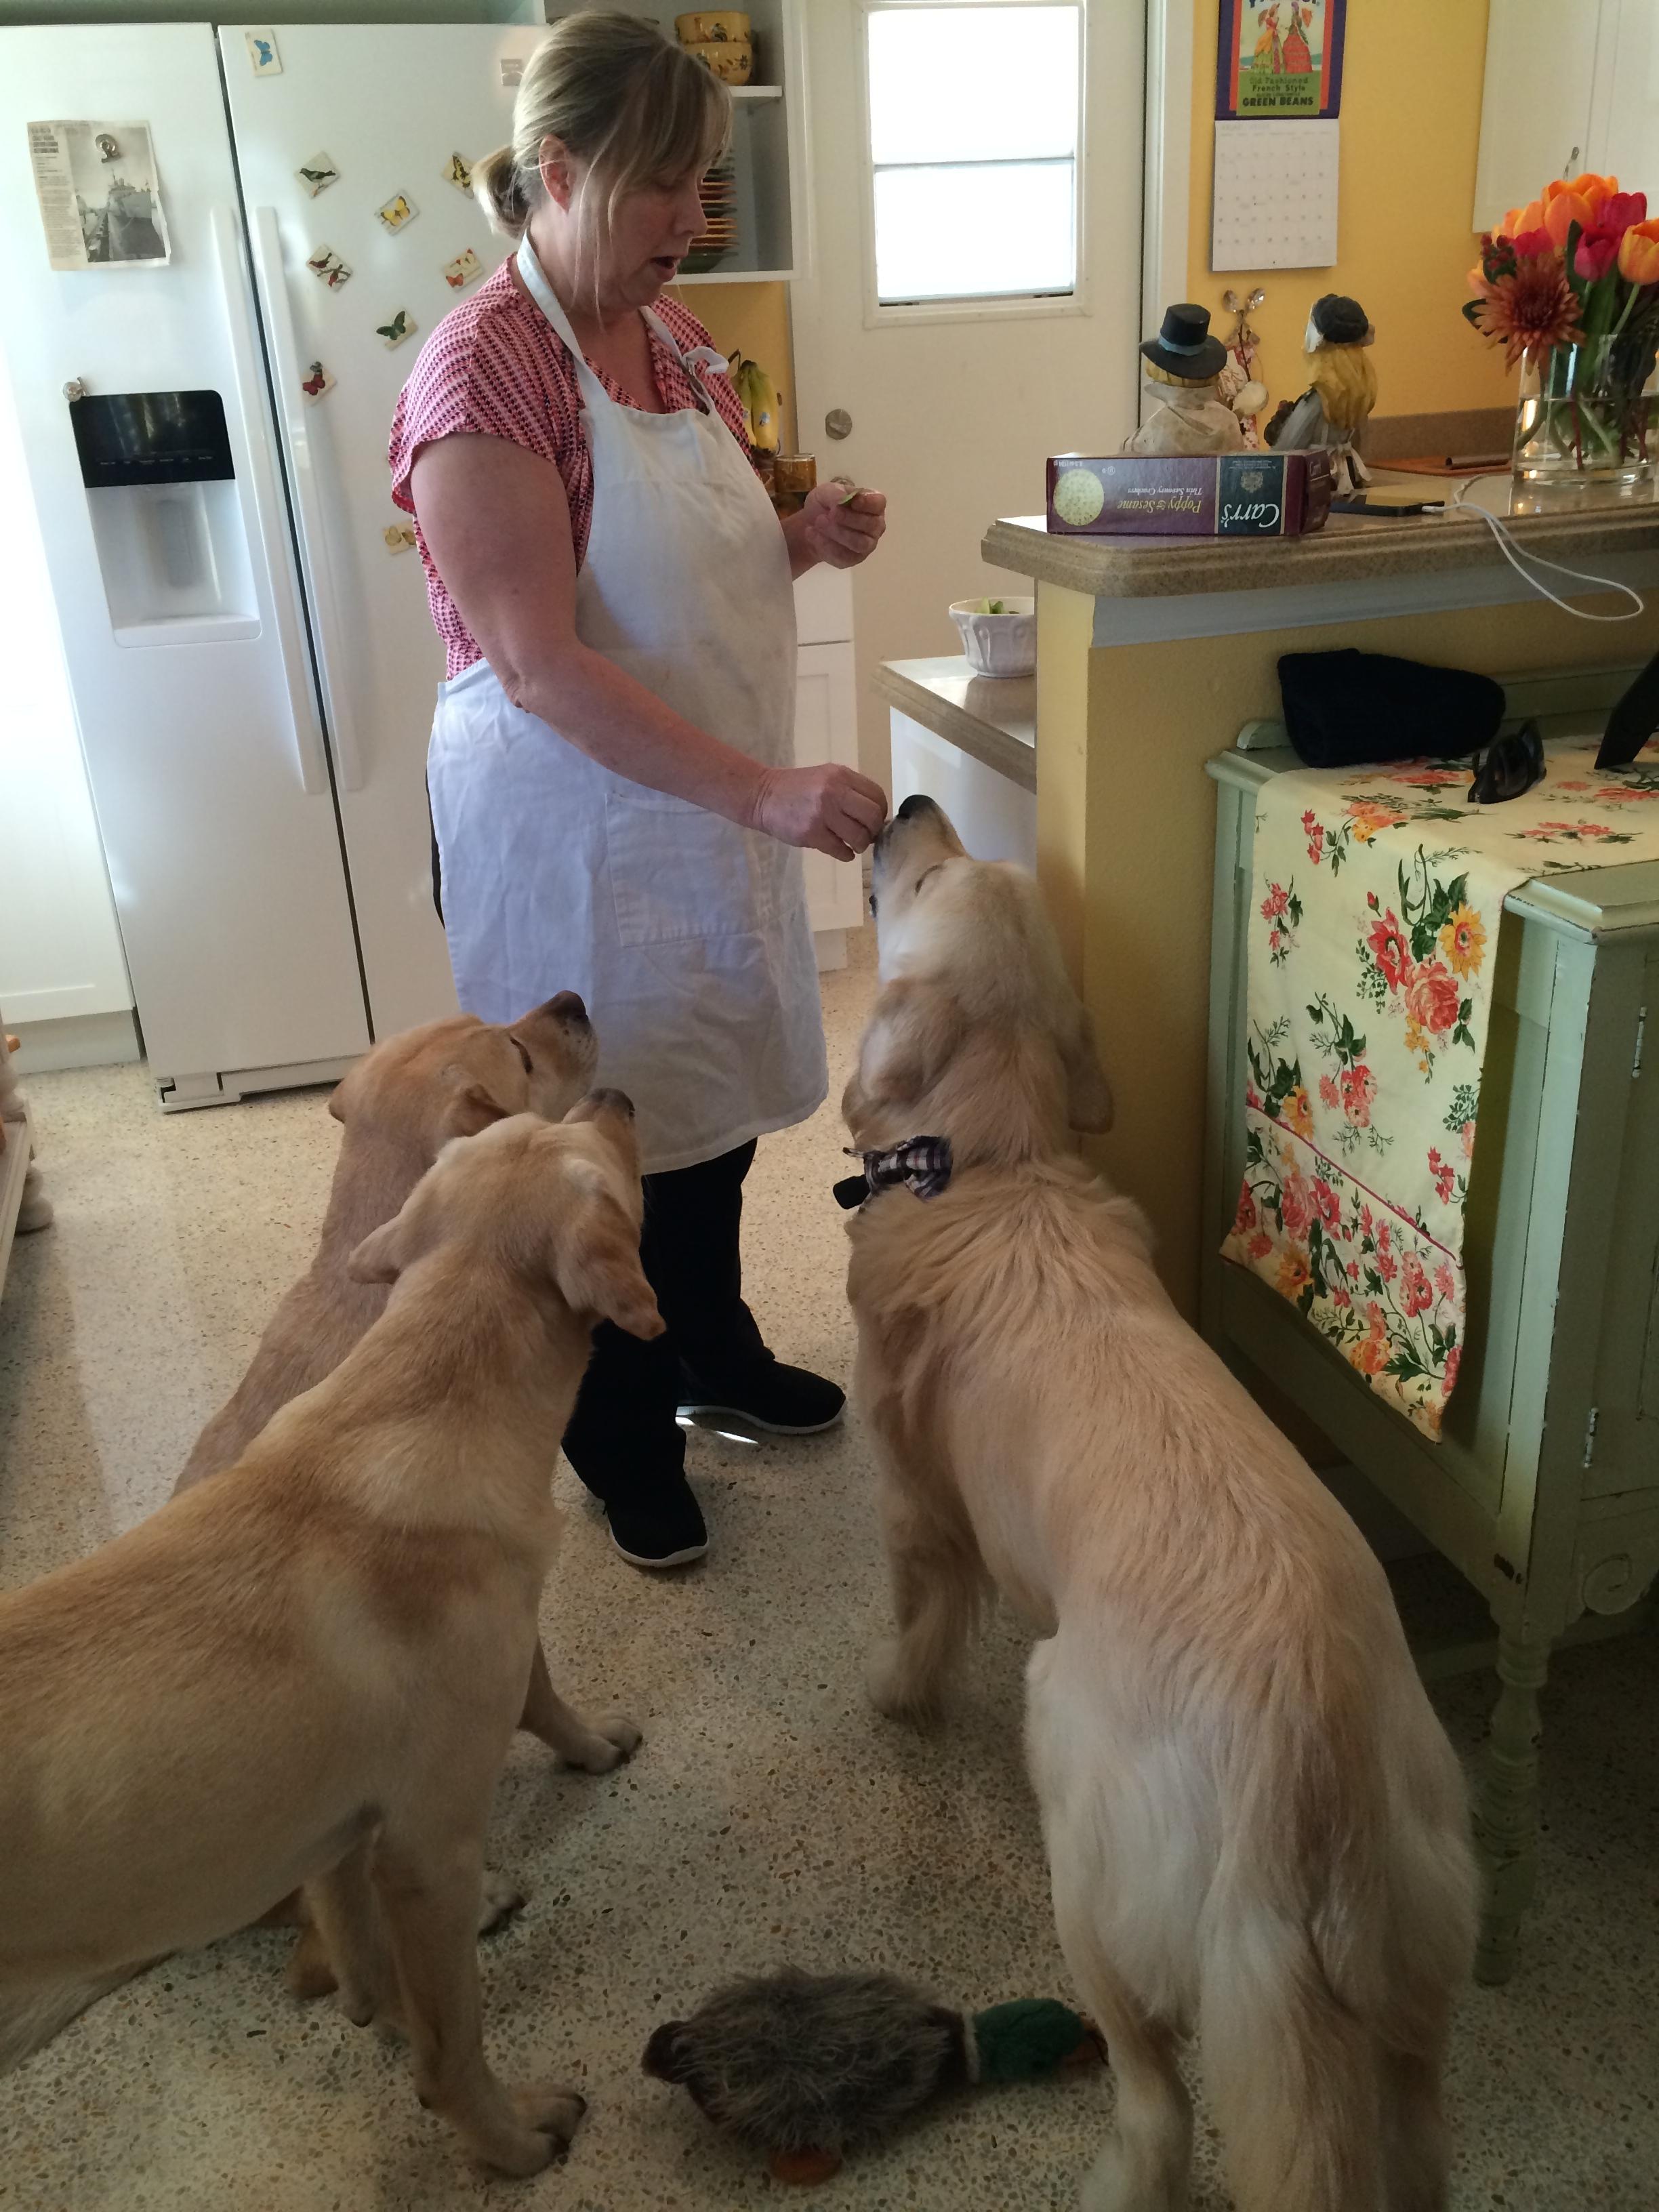 All the boys get apple snacks!